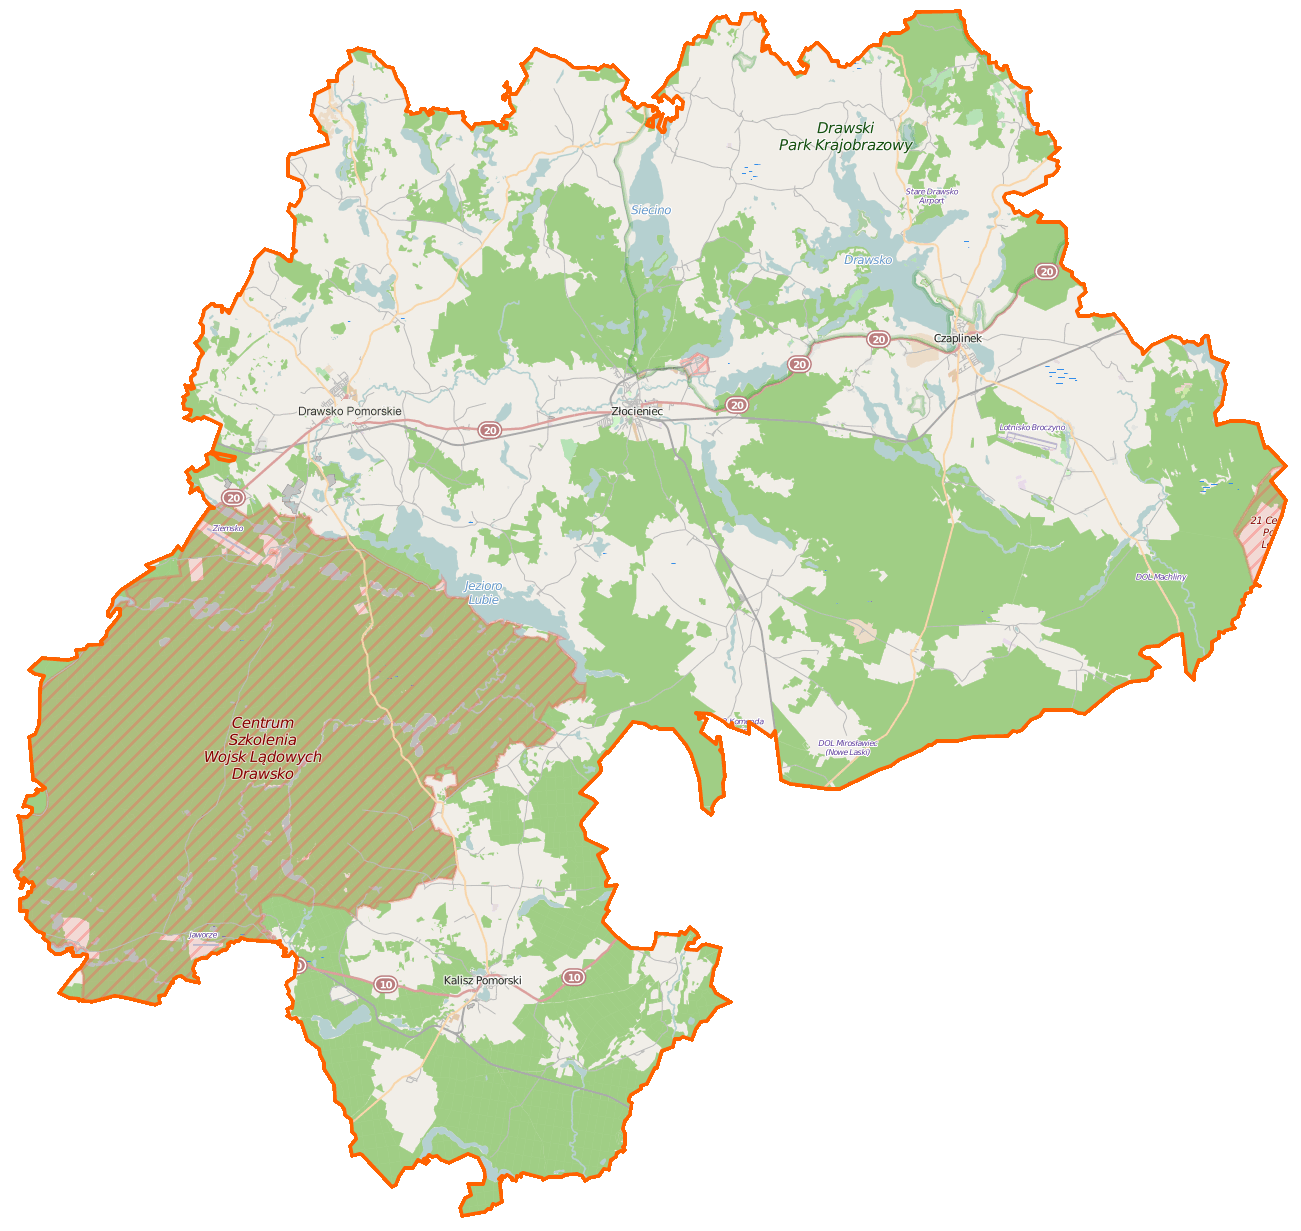 Powiat_drawski_location_map.png